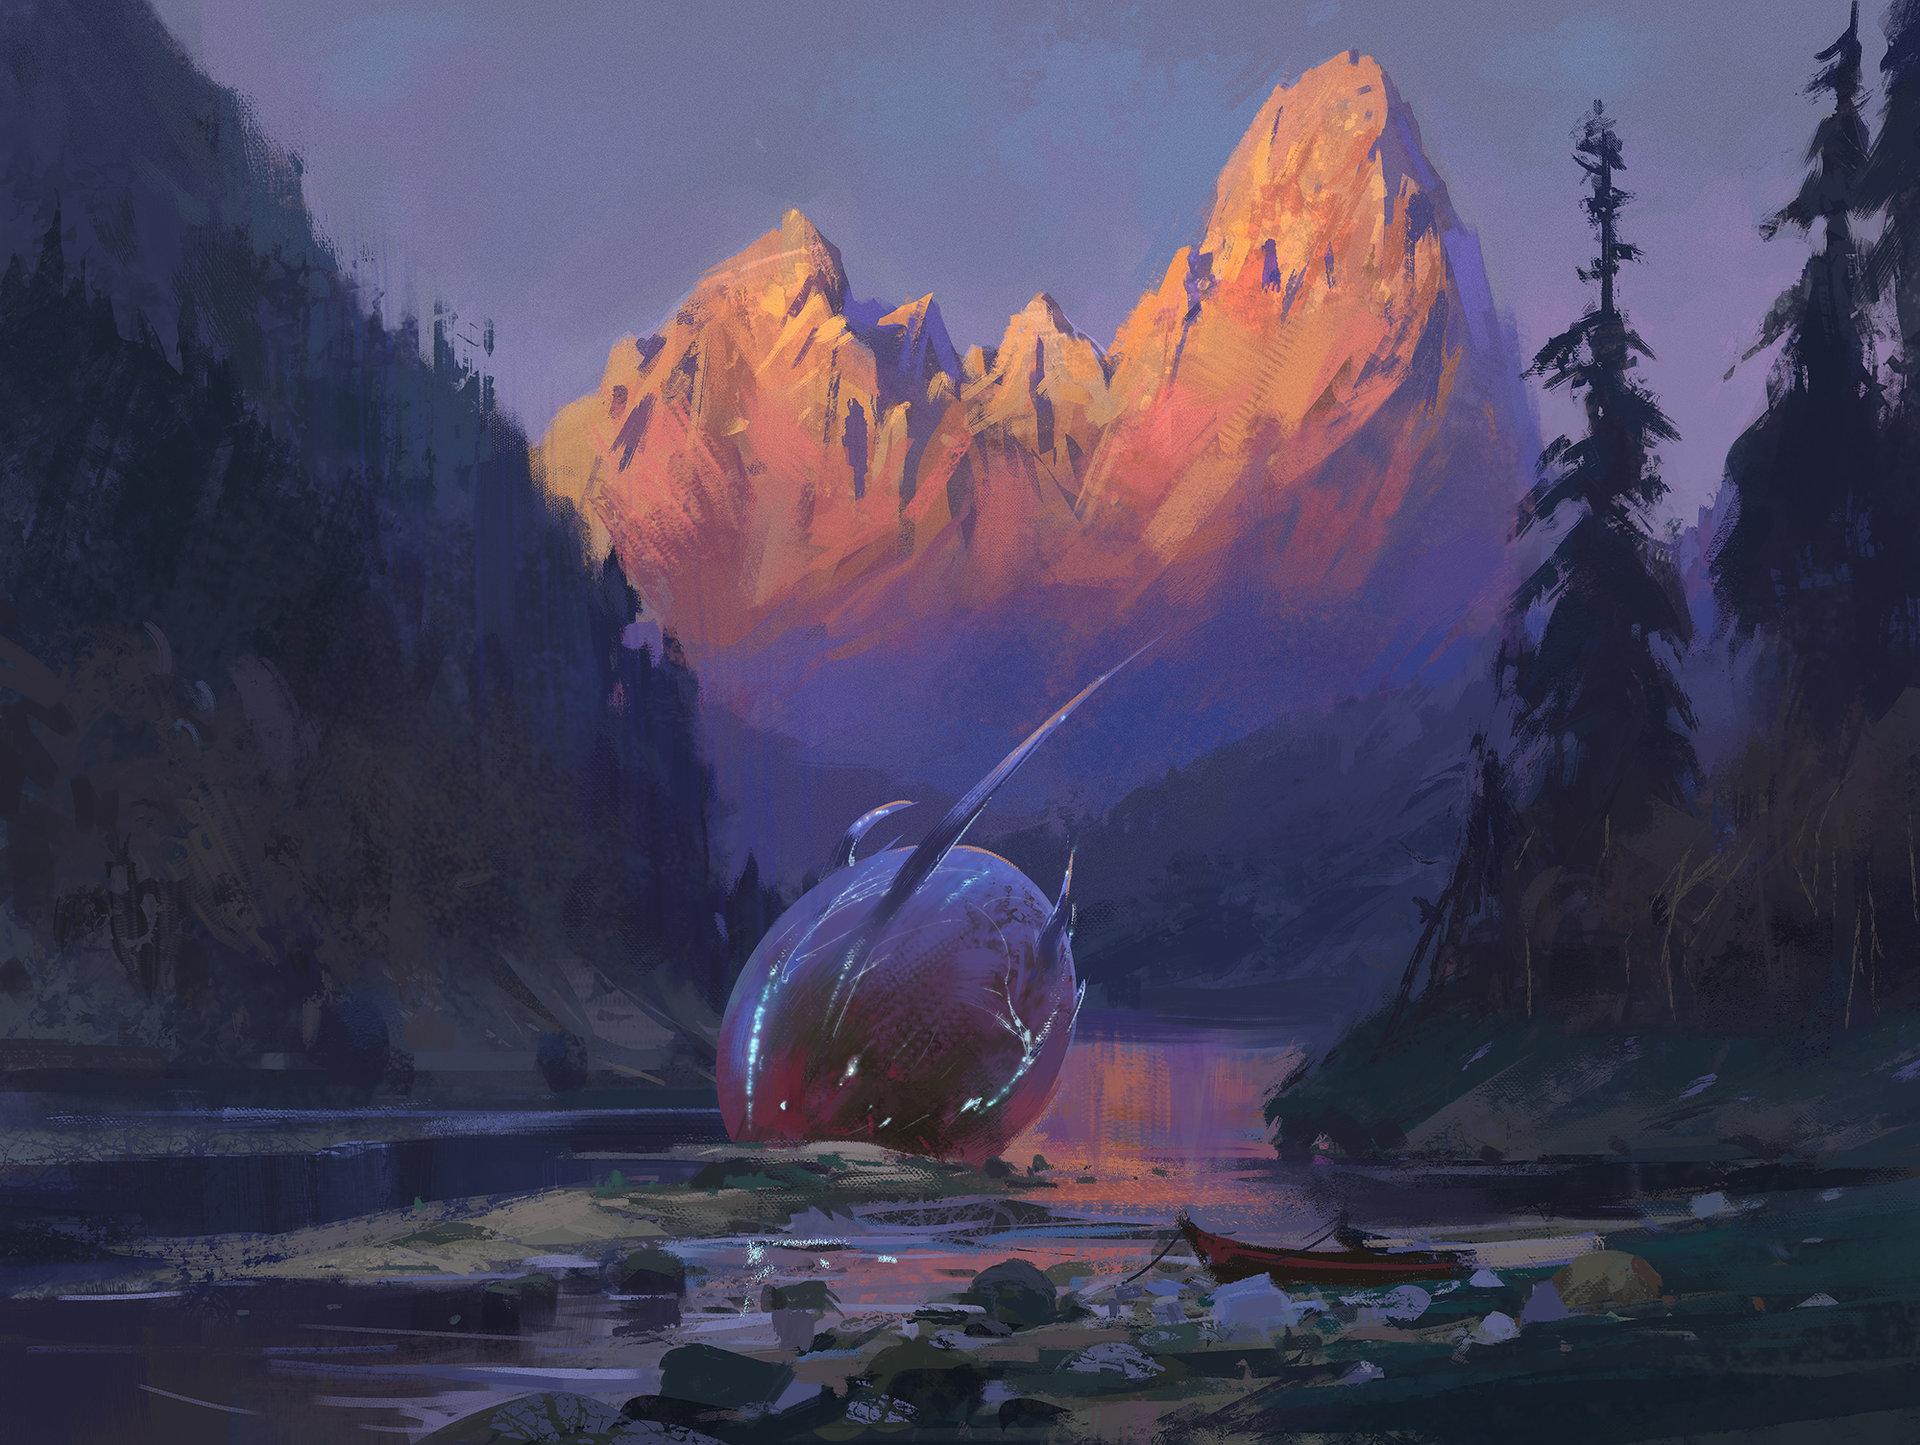 General 1920x1445 nature landscape digital art sunset Nikolai Litvinenko boat mountains trees fantasy art forest